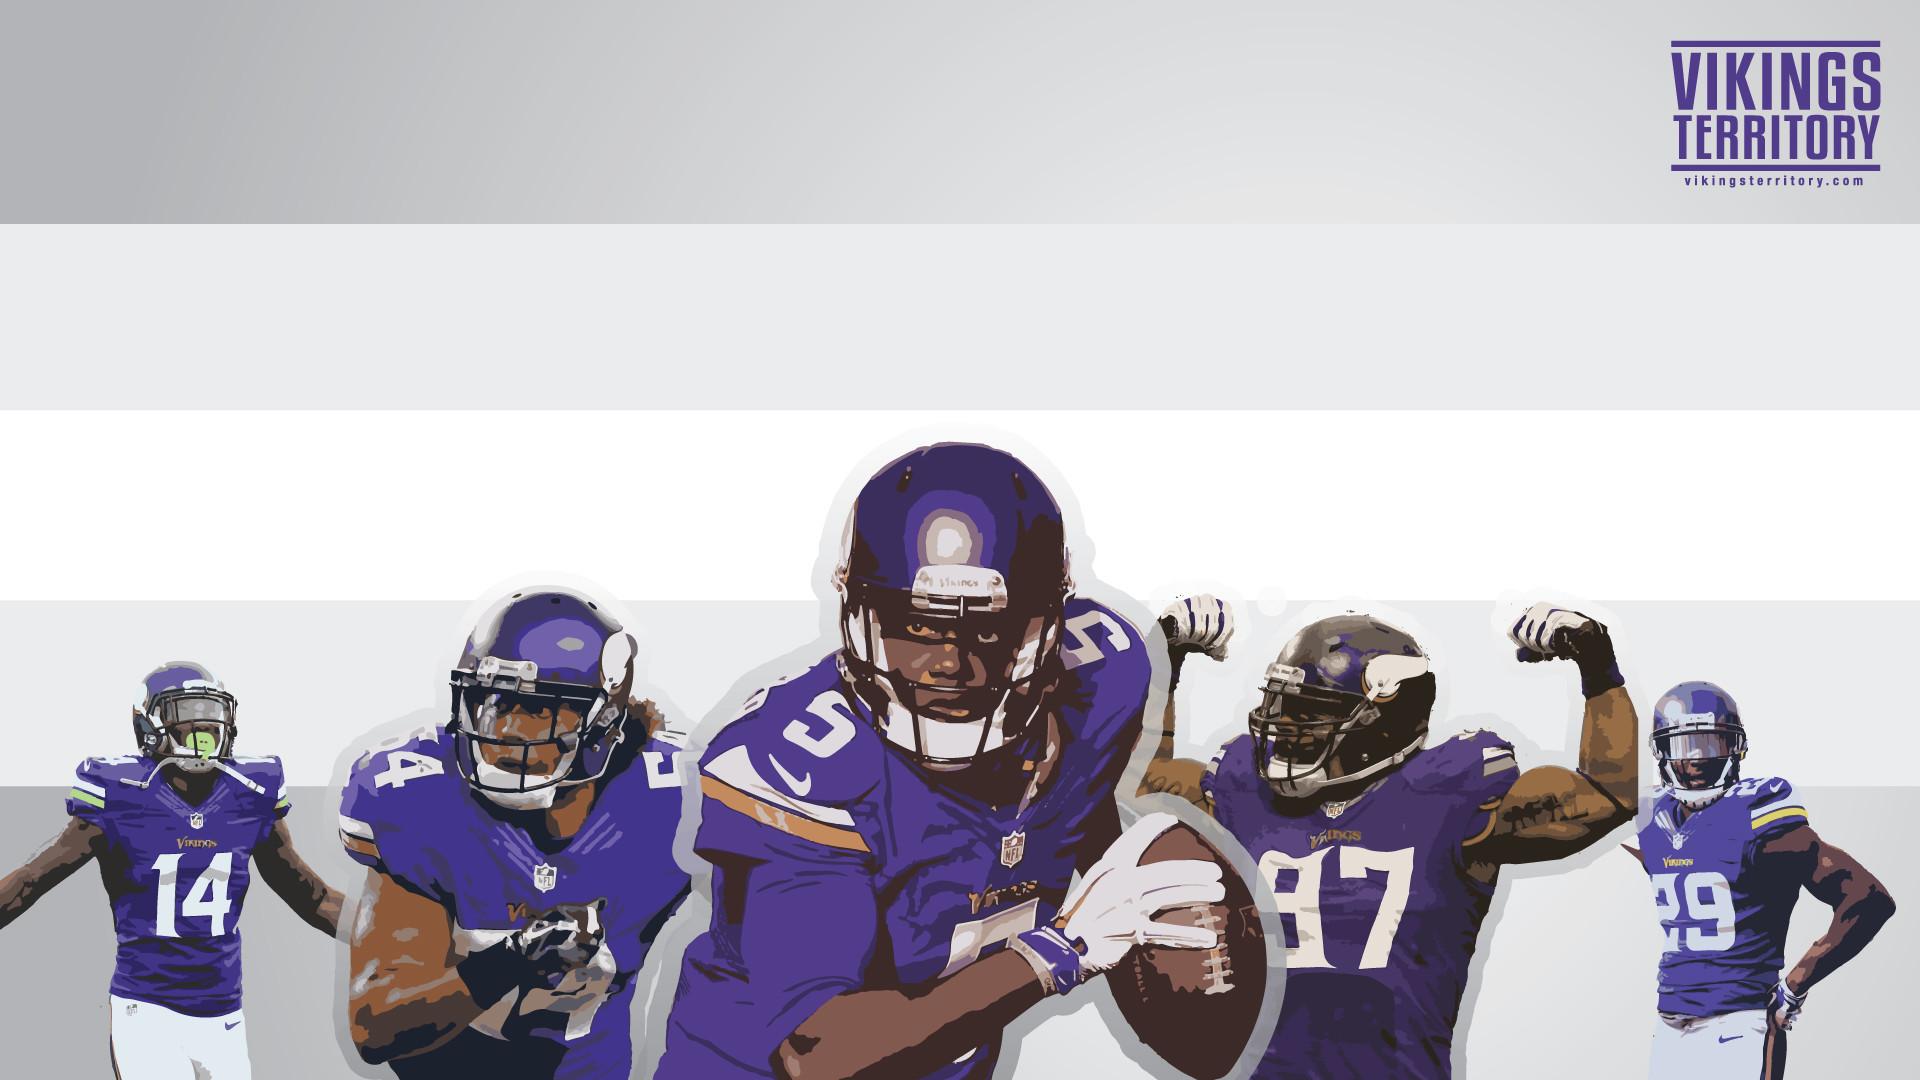 Minnesota Vikings Wallpaper